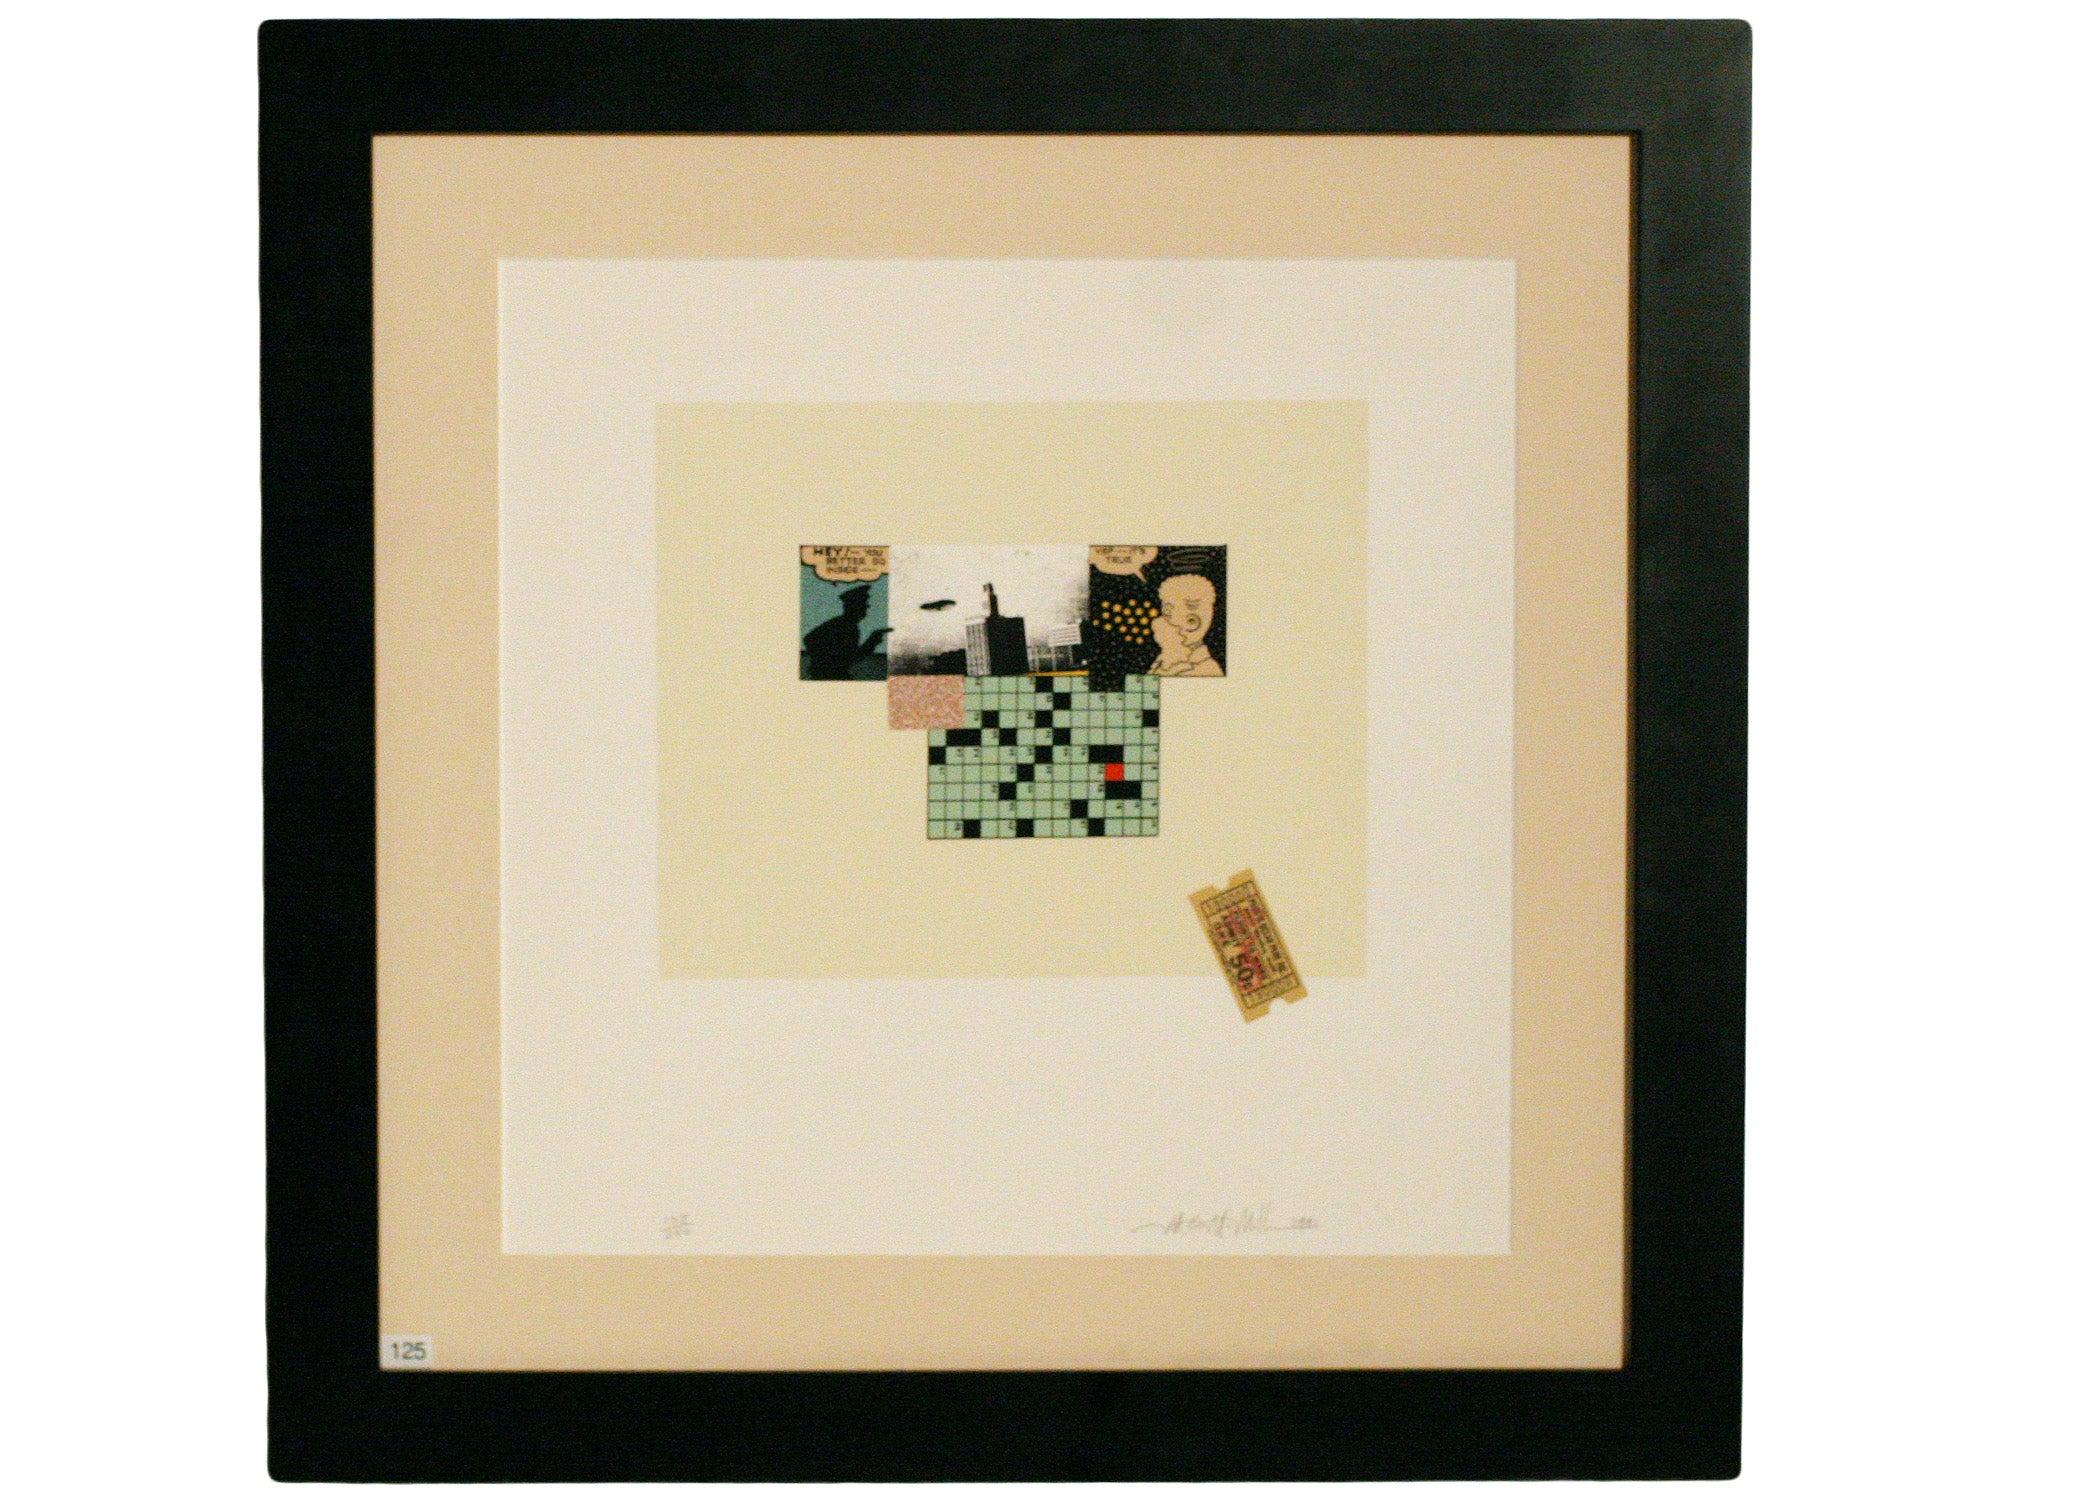 Michael McMillen 11 Color Silkscreen Print, 1991